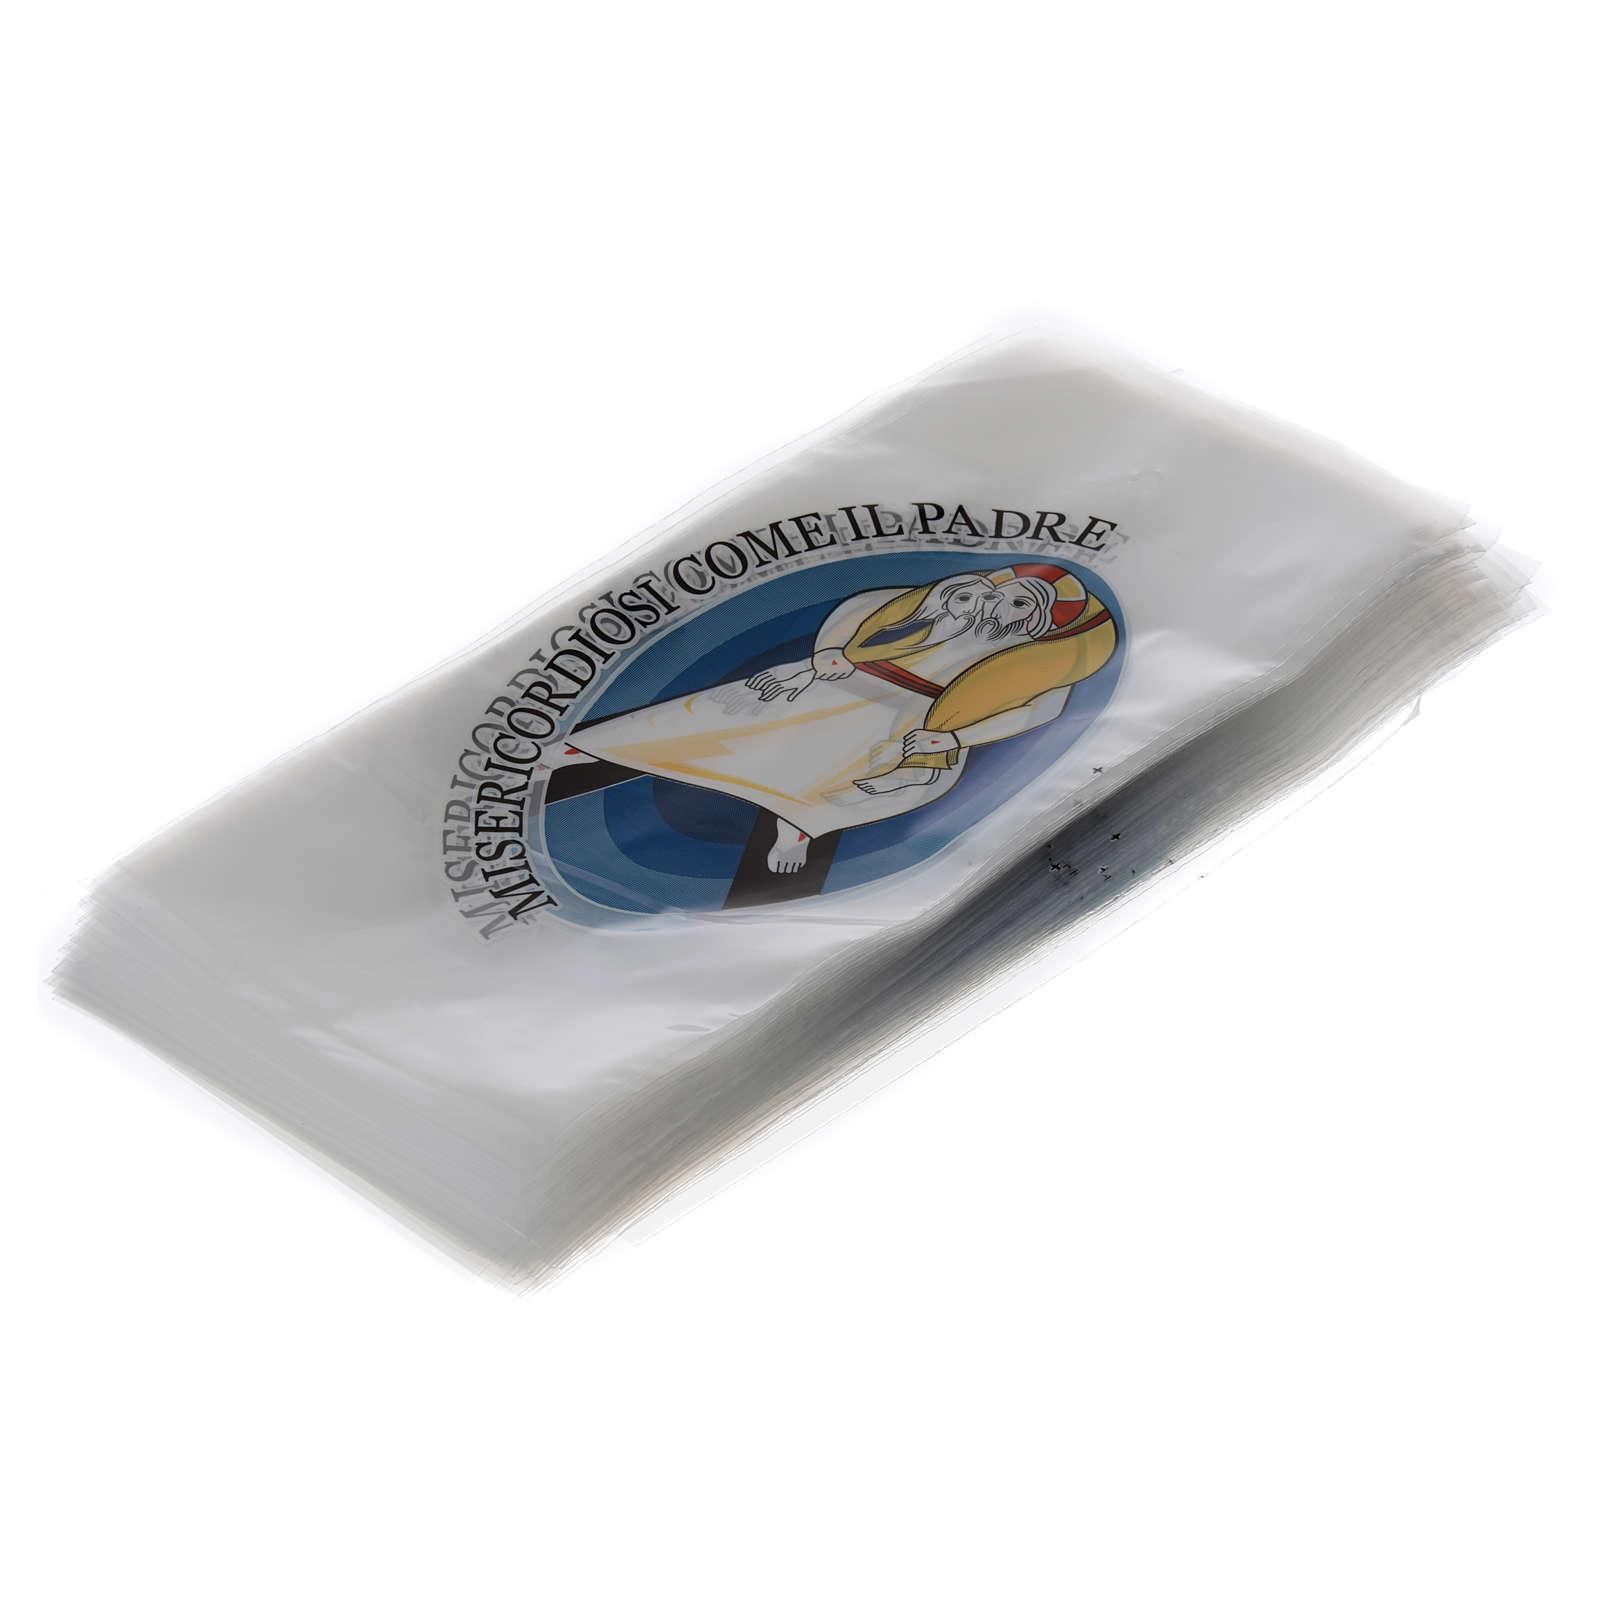 STOCK Busta per Palme ulivo 500 pz logo Giubileo Misericordia 3